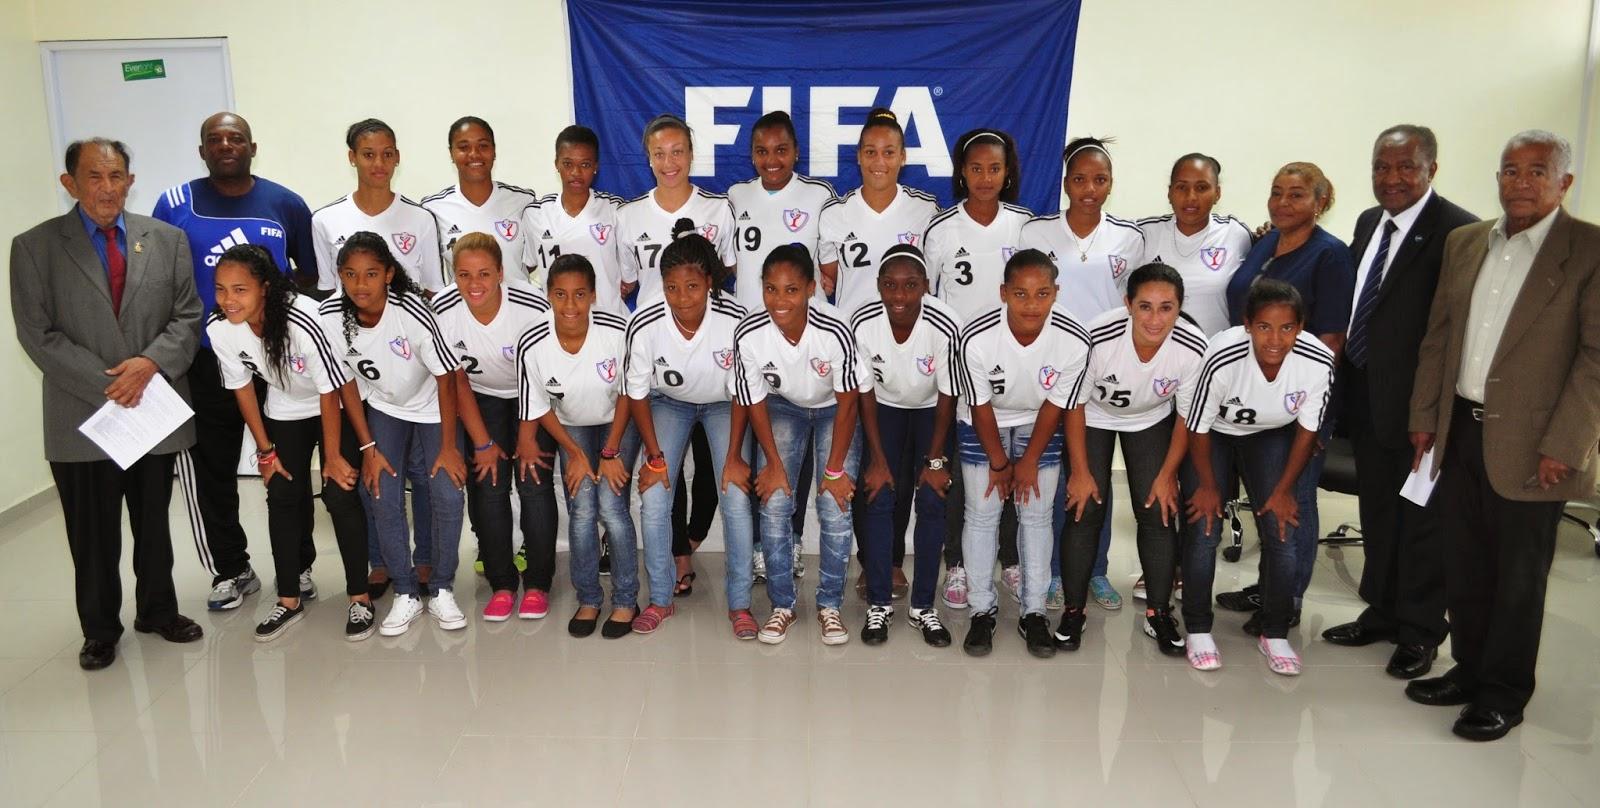 Copa del Caribe Femenina este miércoles en San Cristóbal